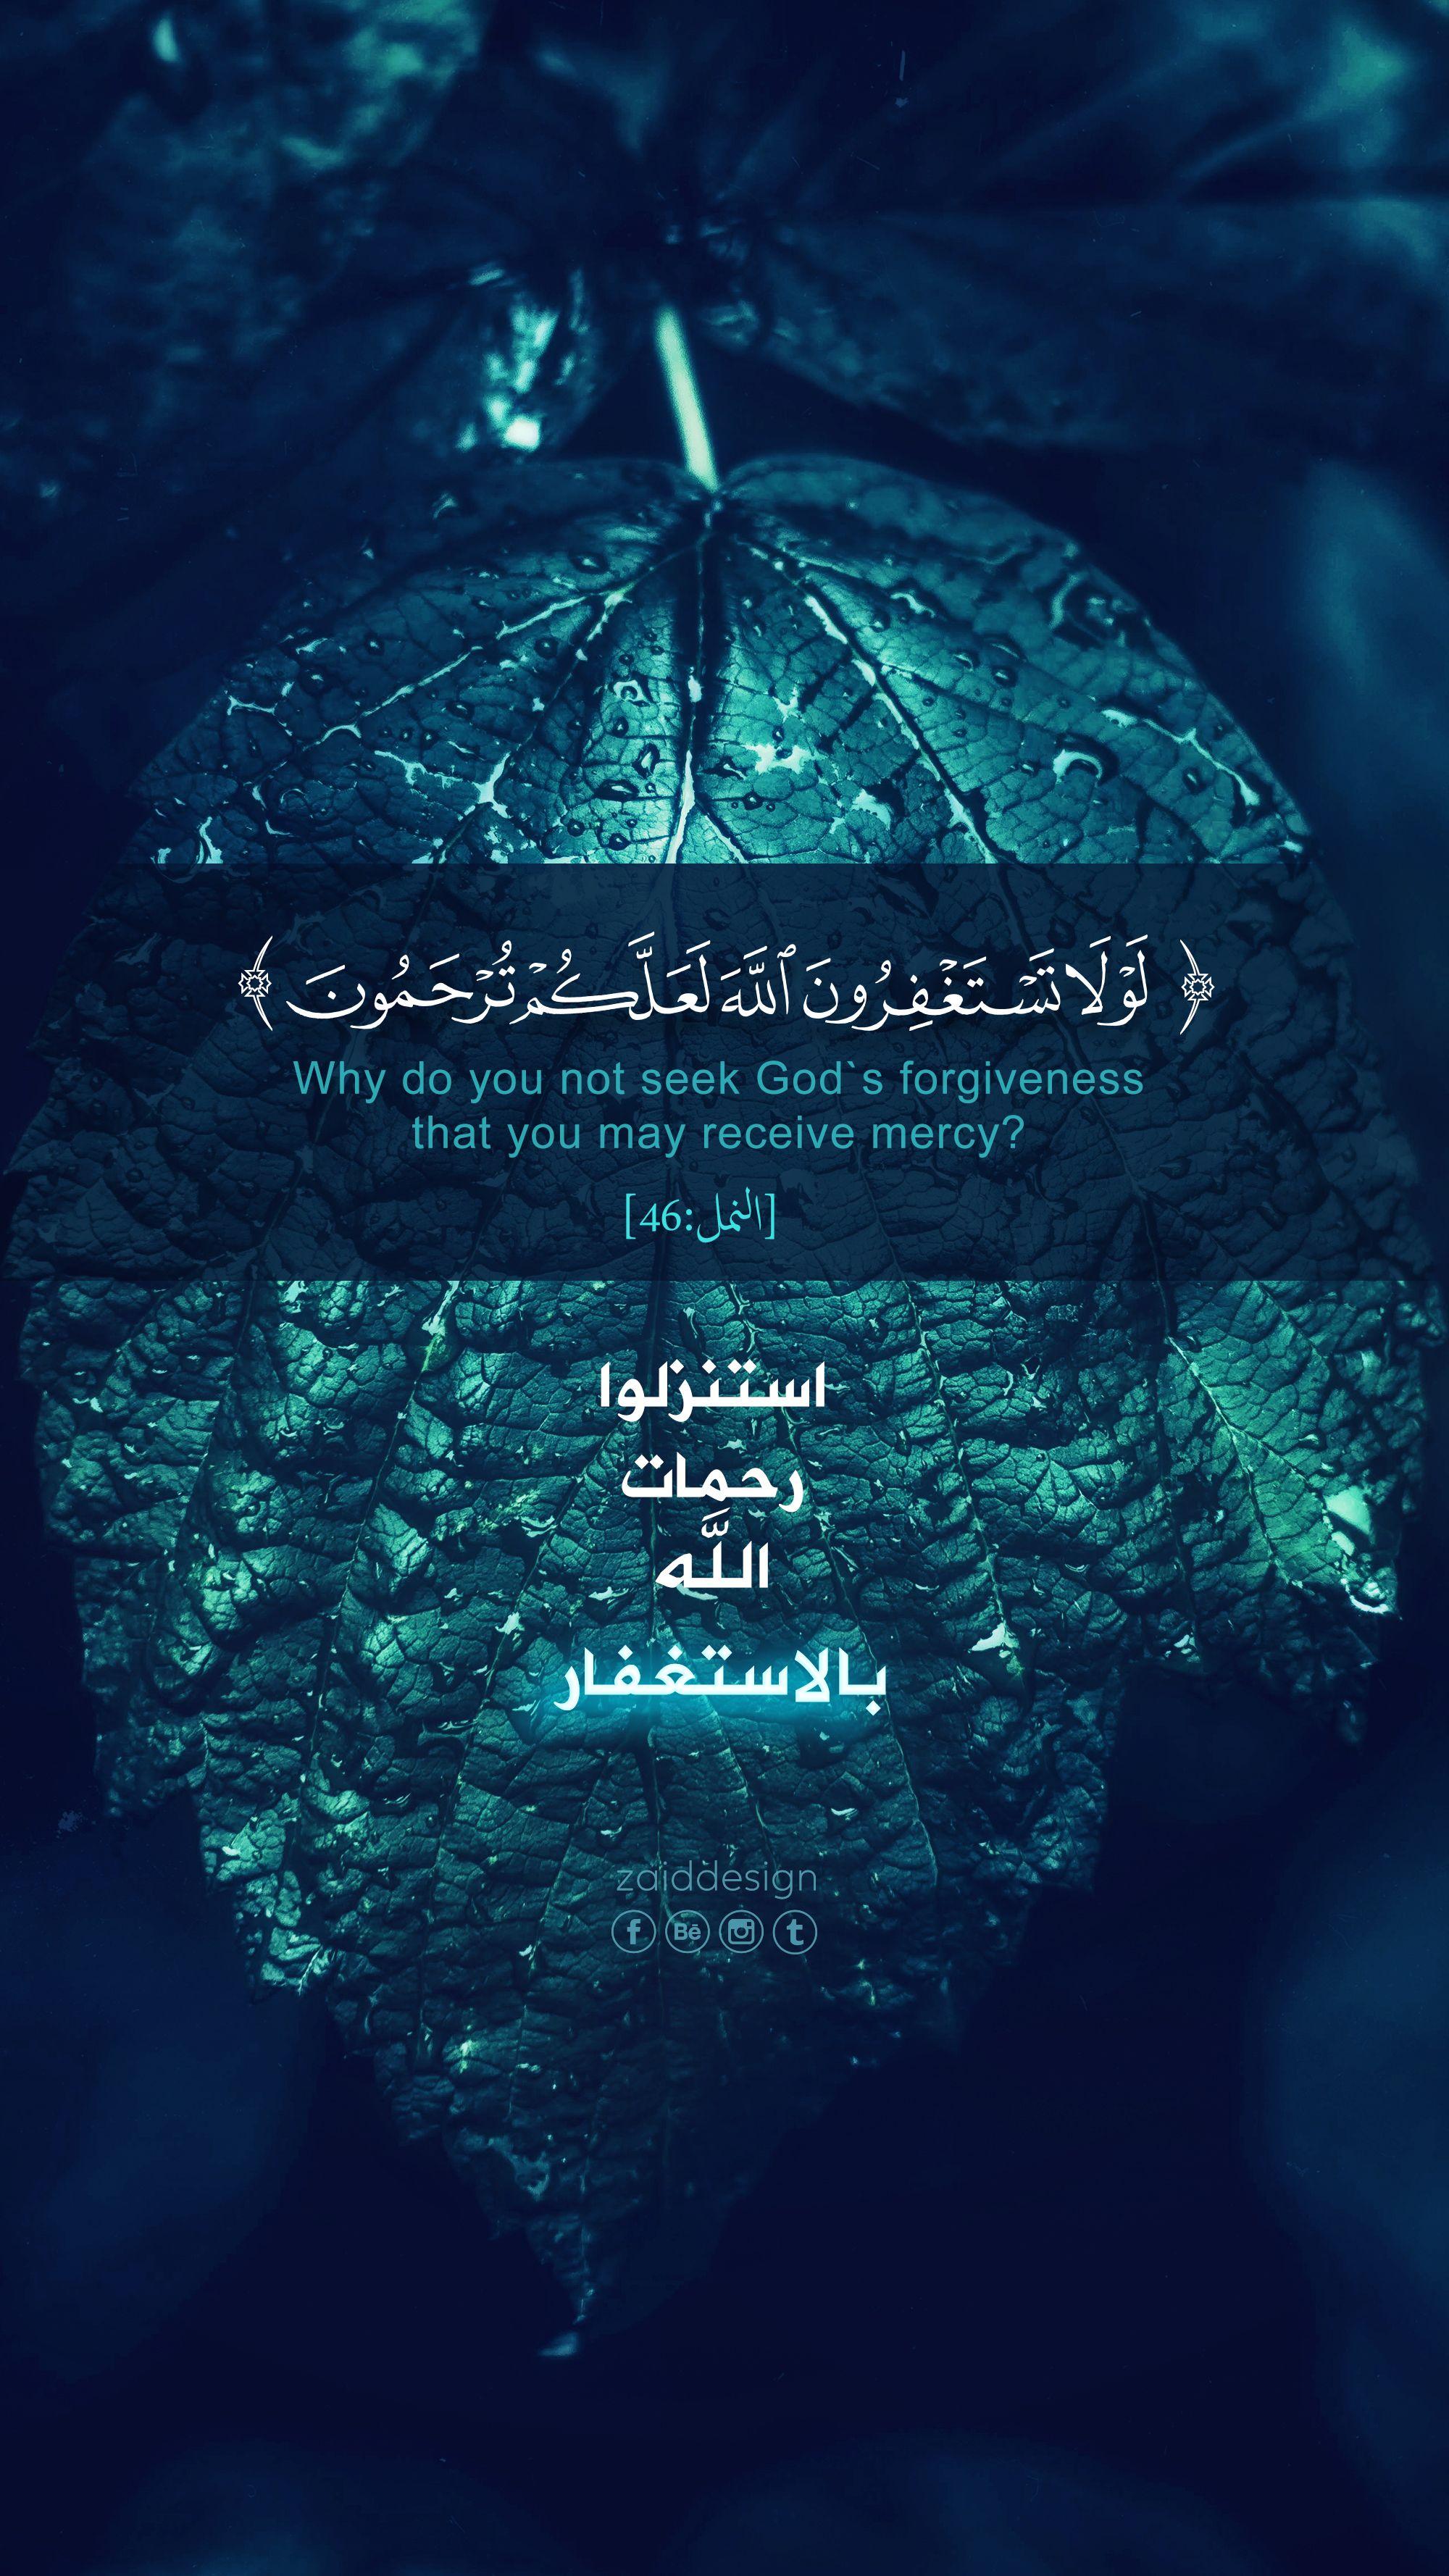 الاستغفار Quran Quotes Love Quran Book Quran Quotes Verses